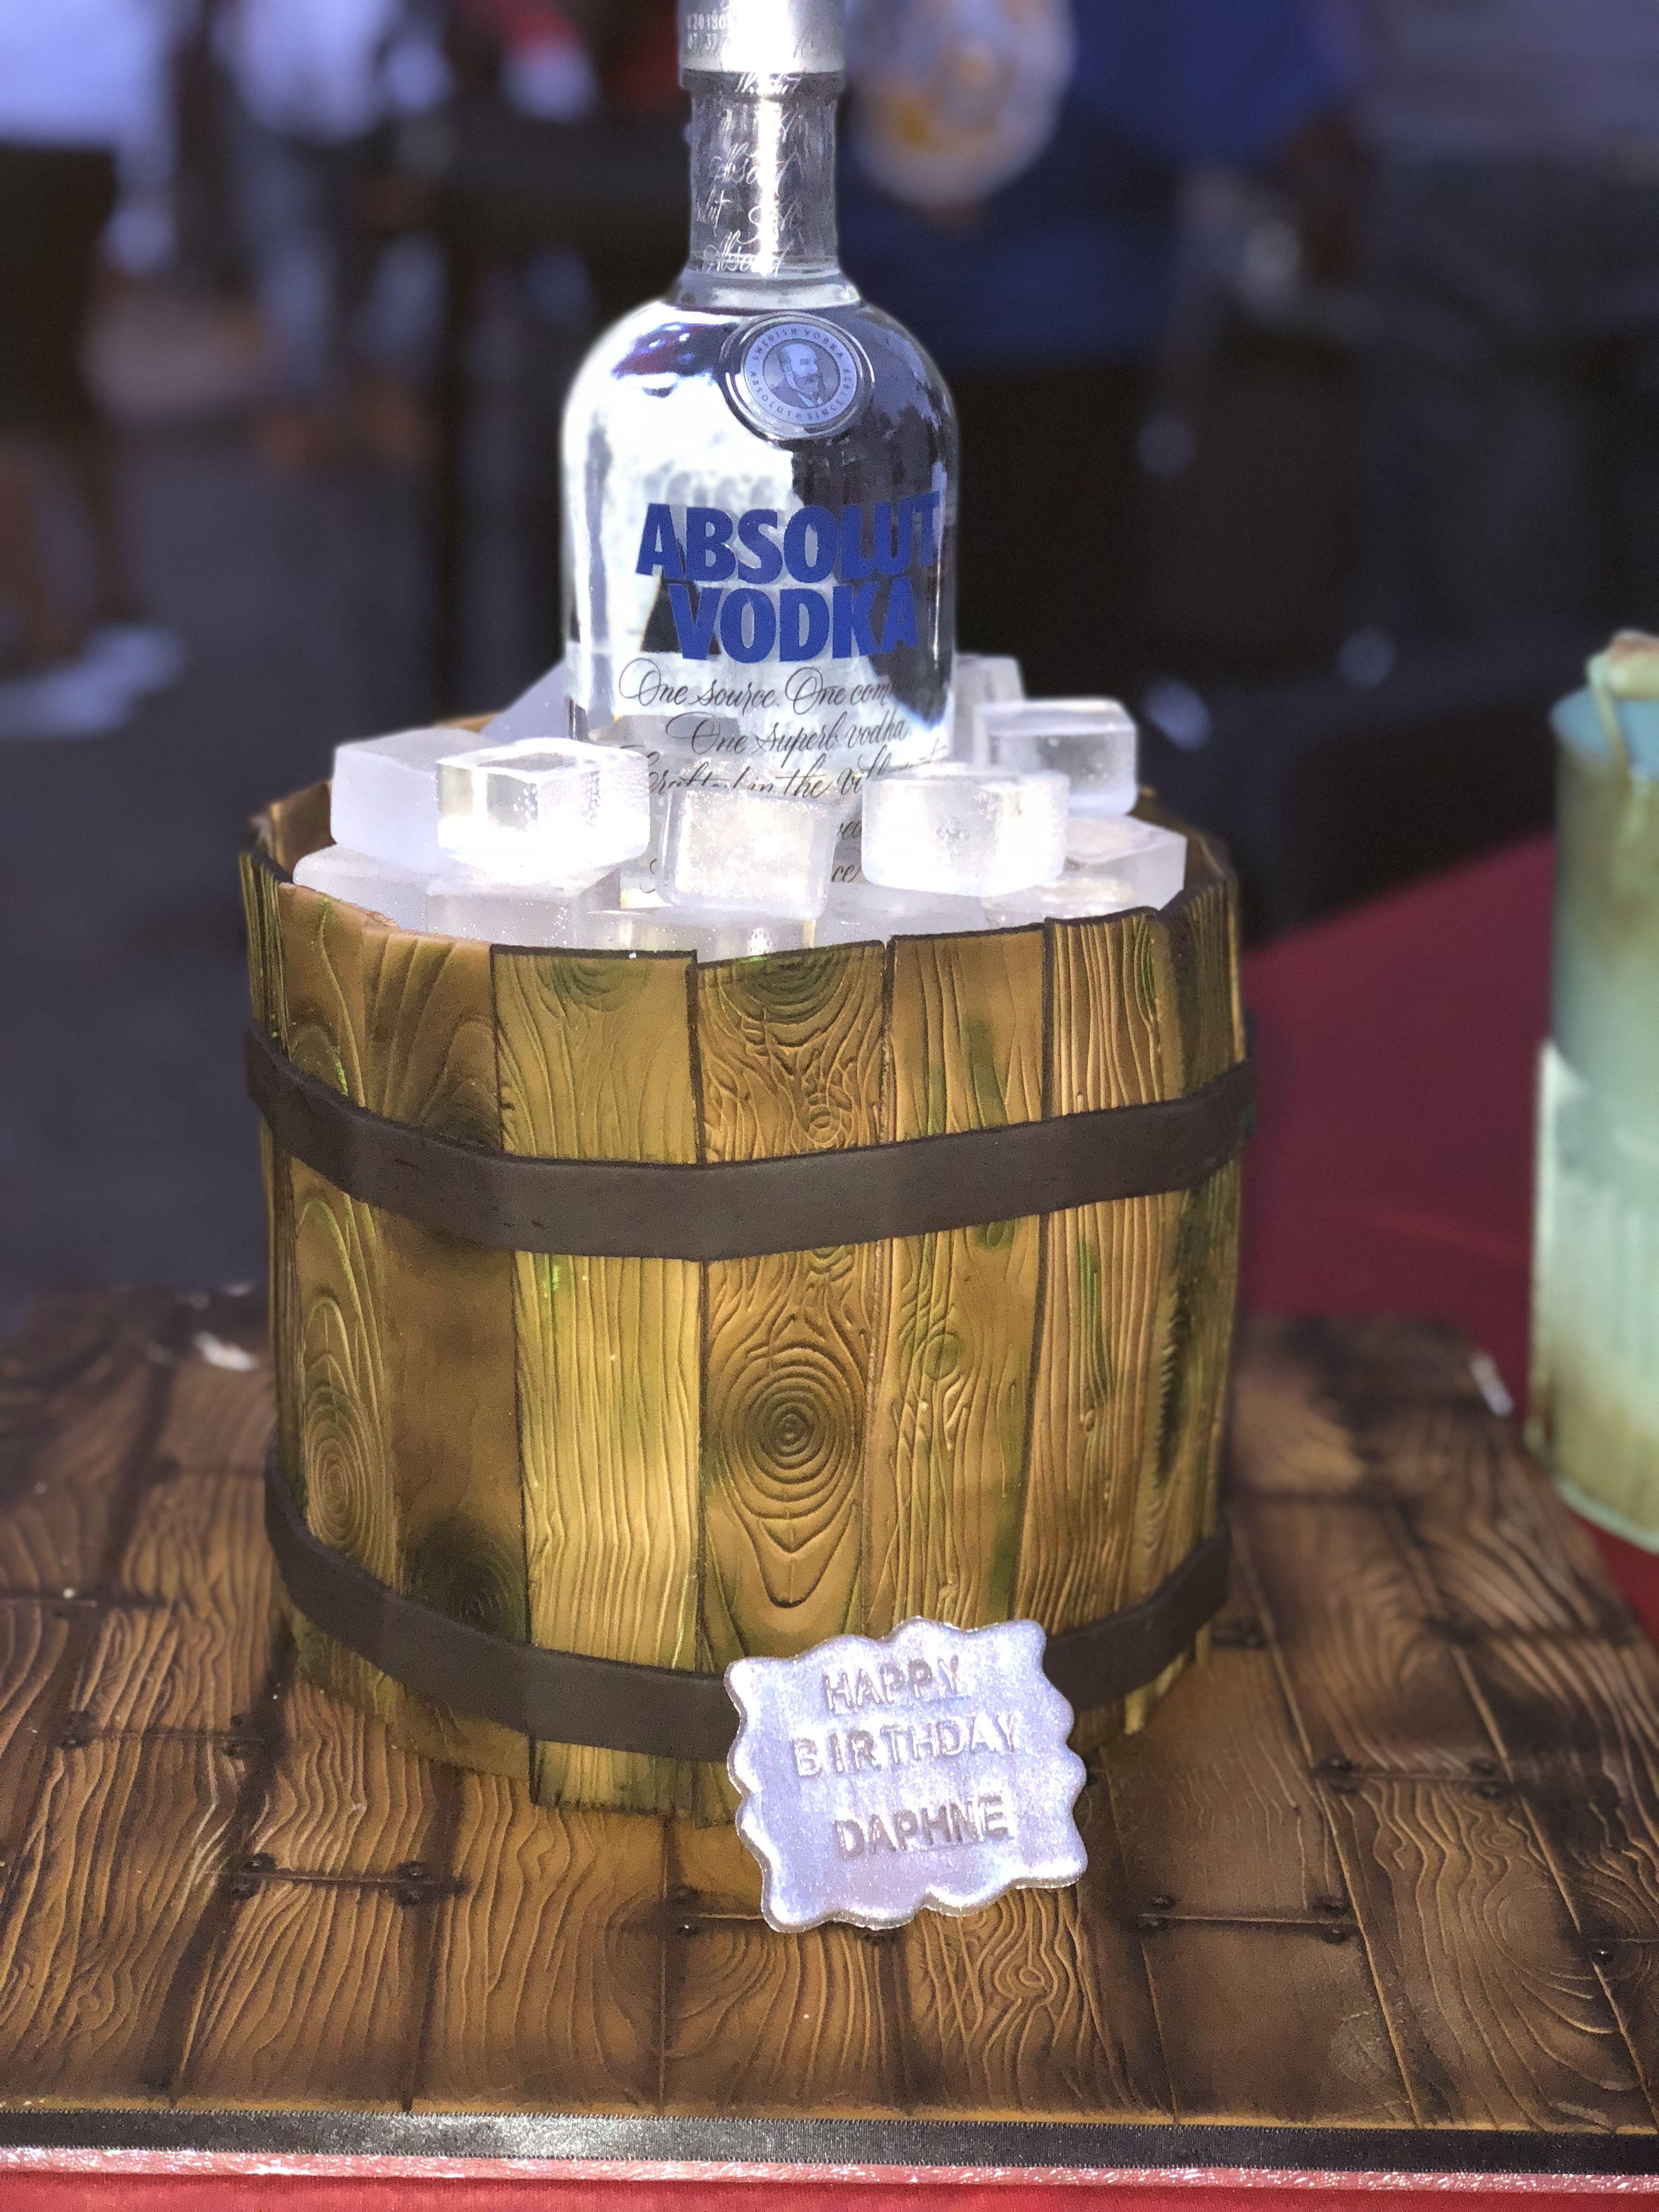 Absolute vodka cake vodka cakes for men barrel cake